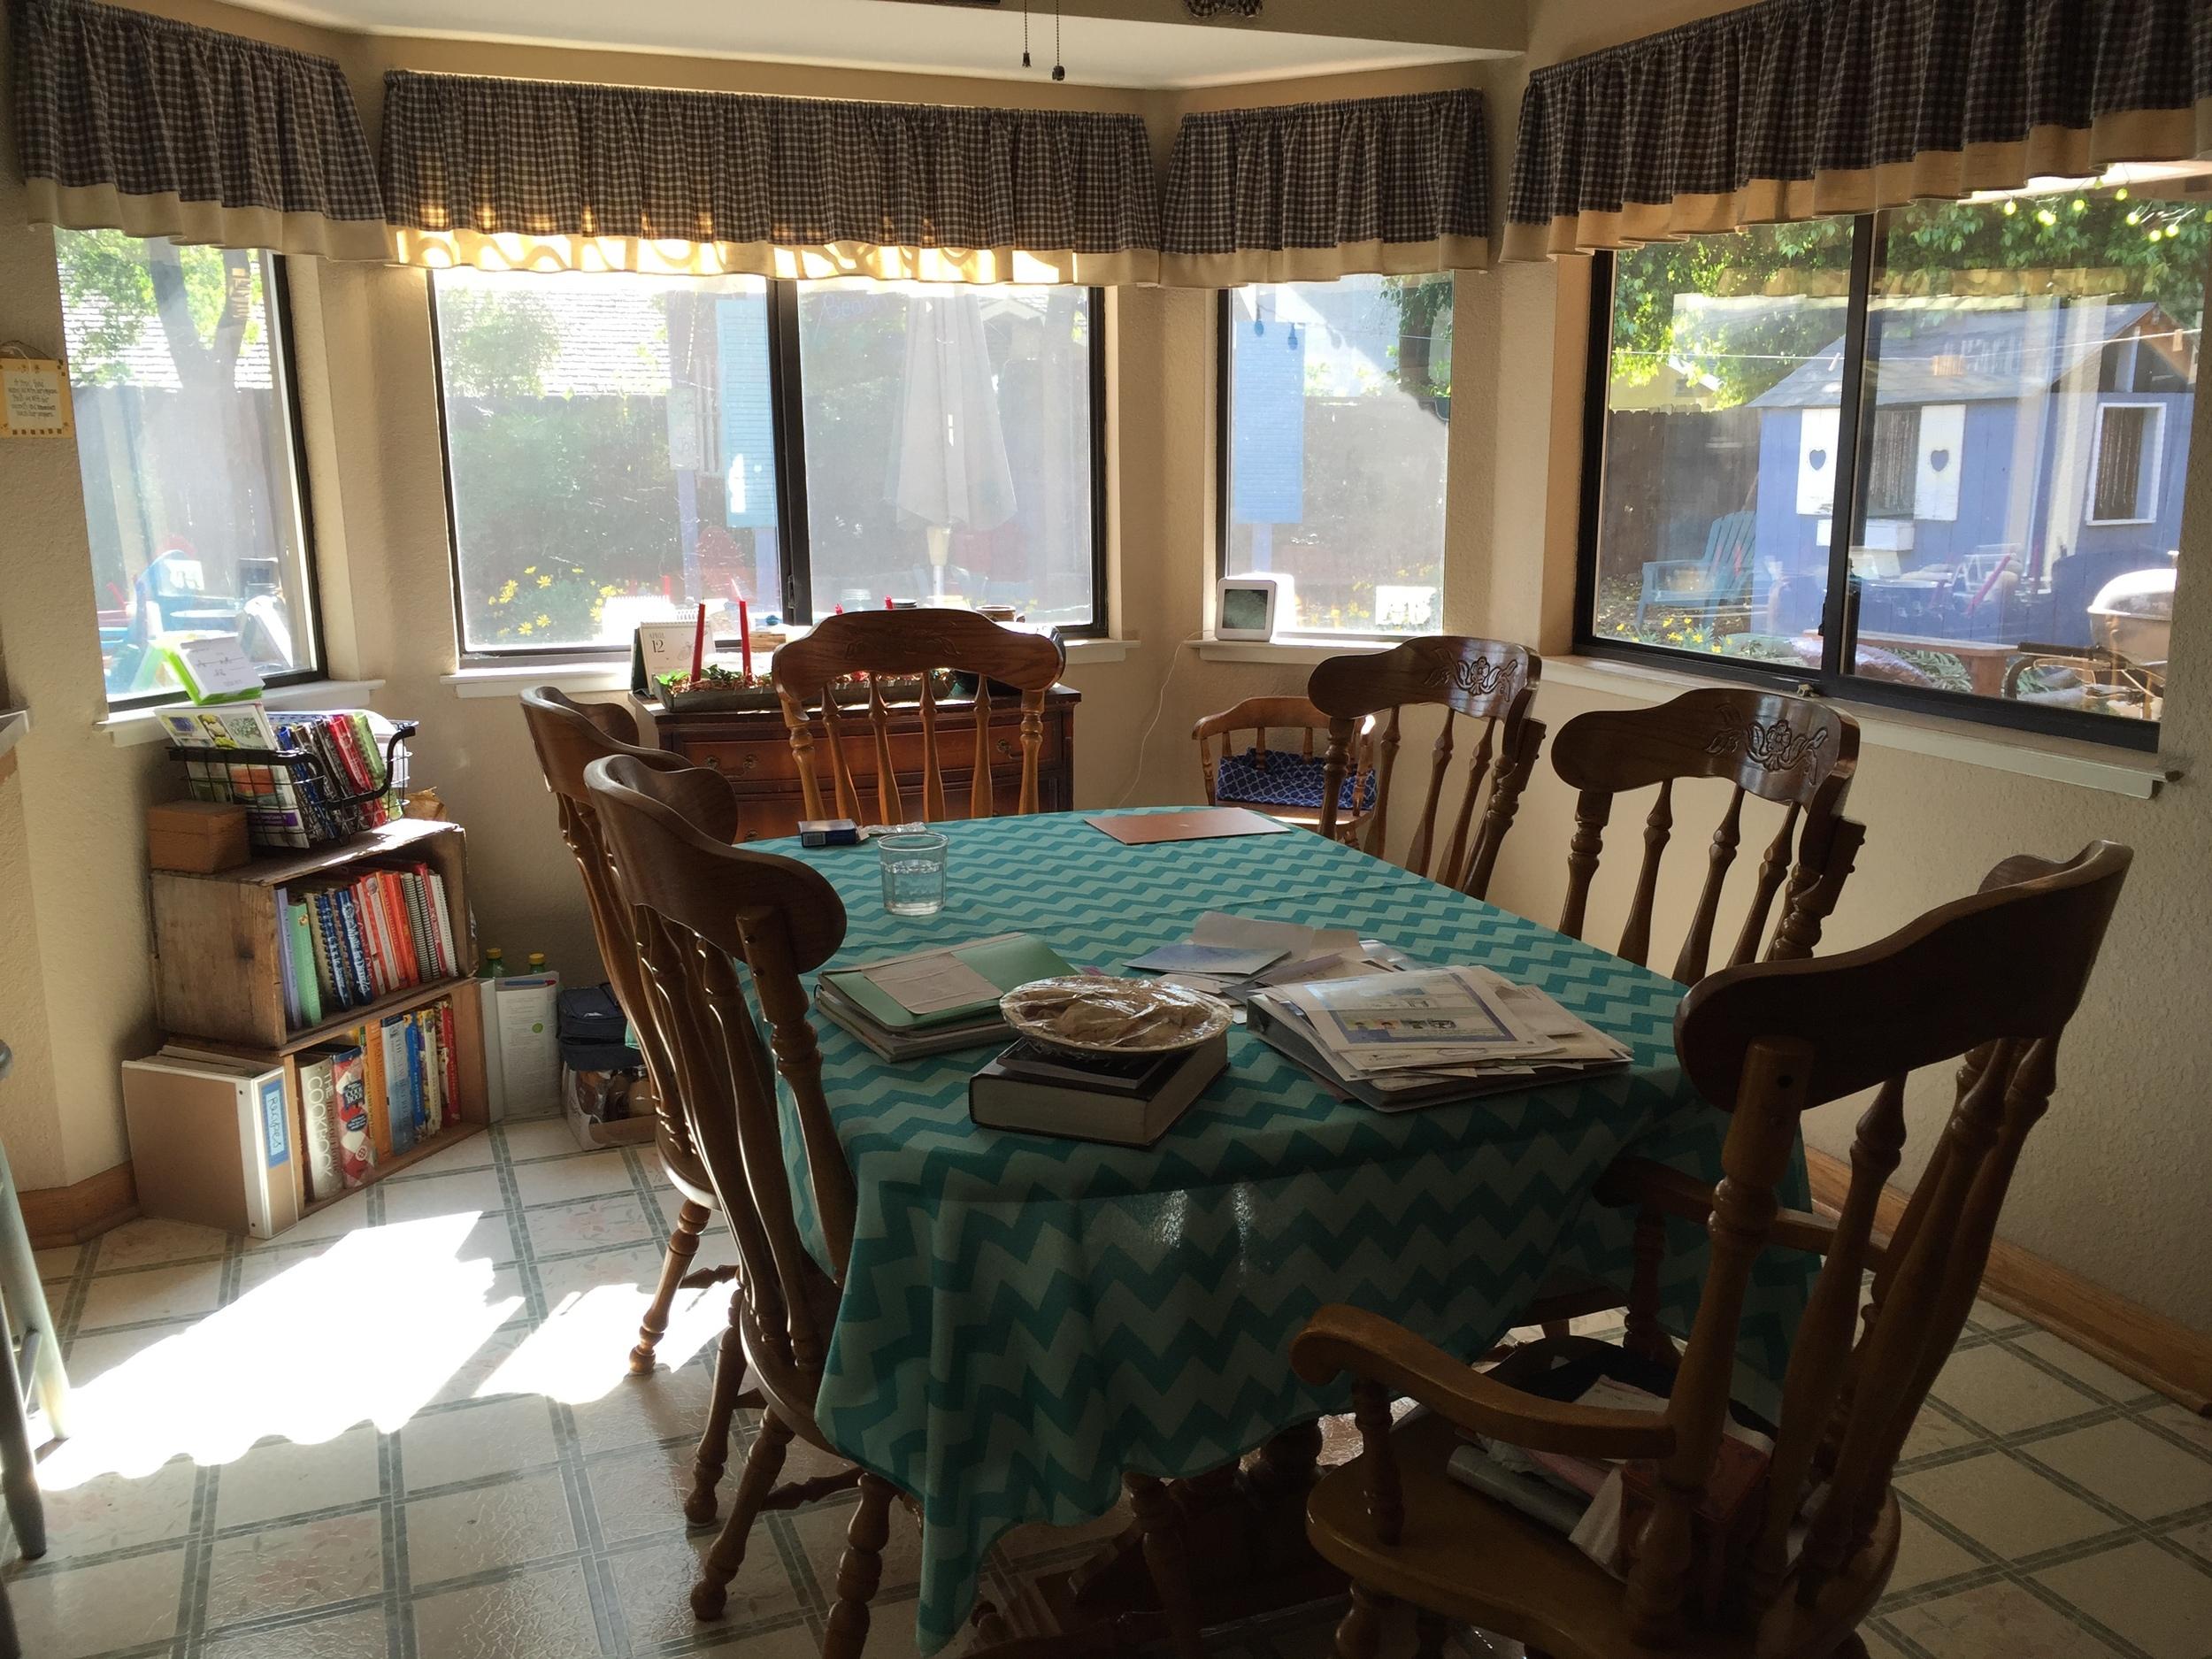 Kickstart to Clutter Free - Dining Room